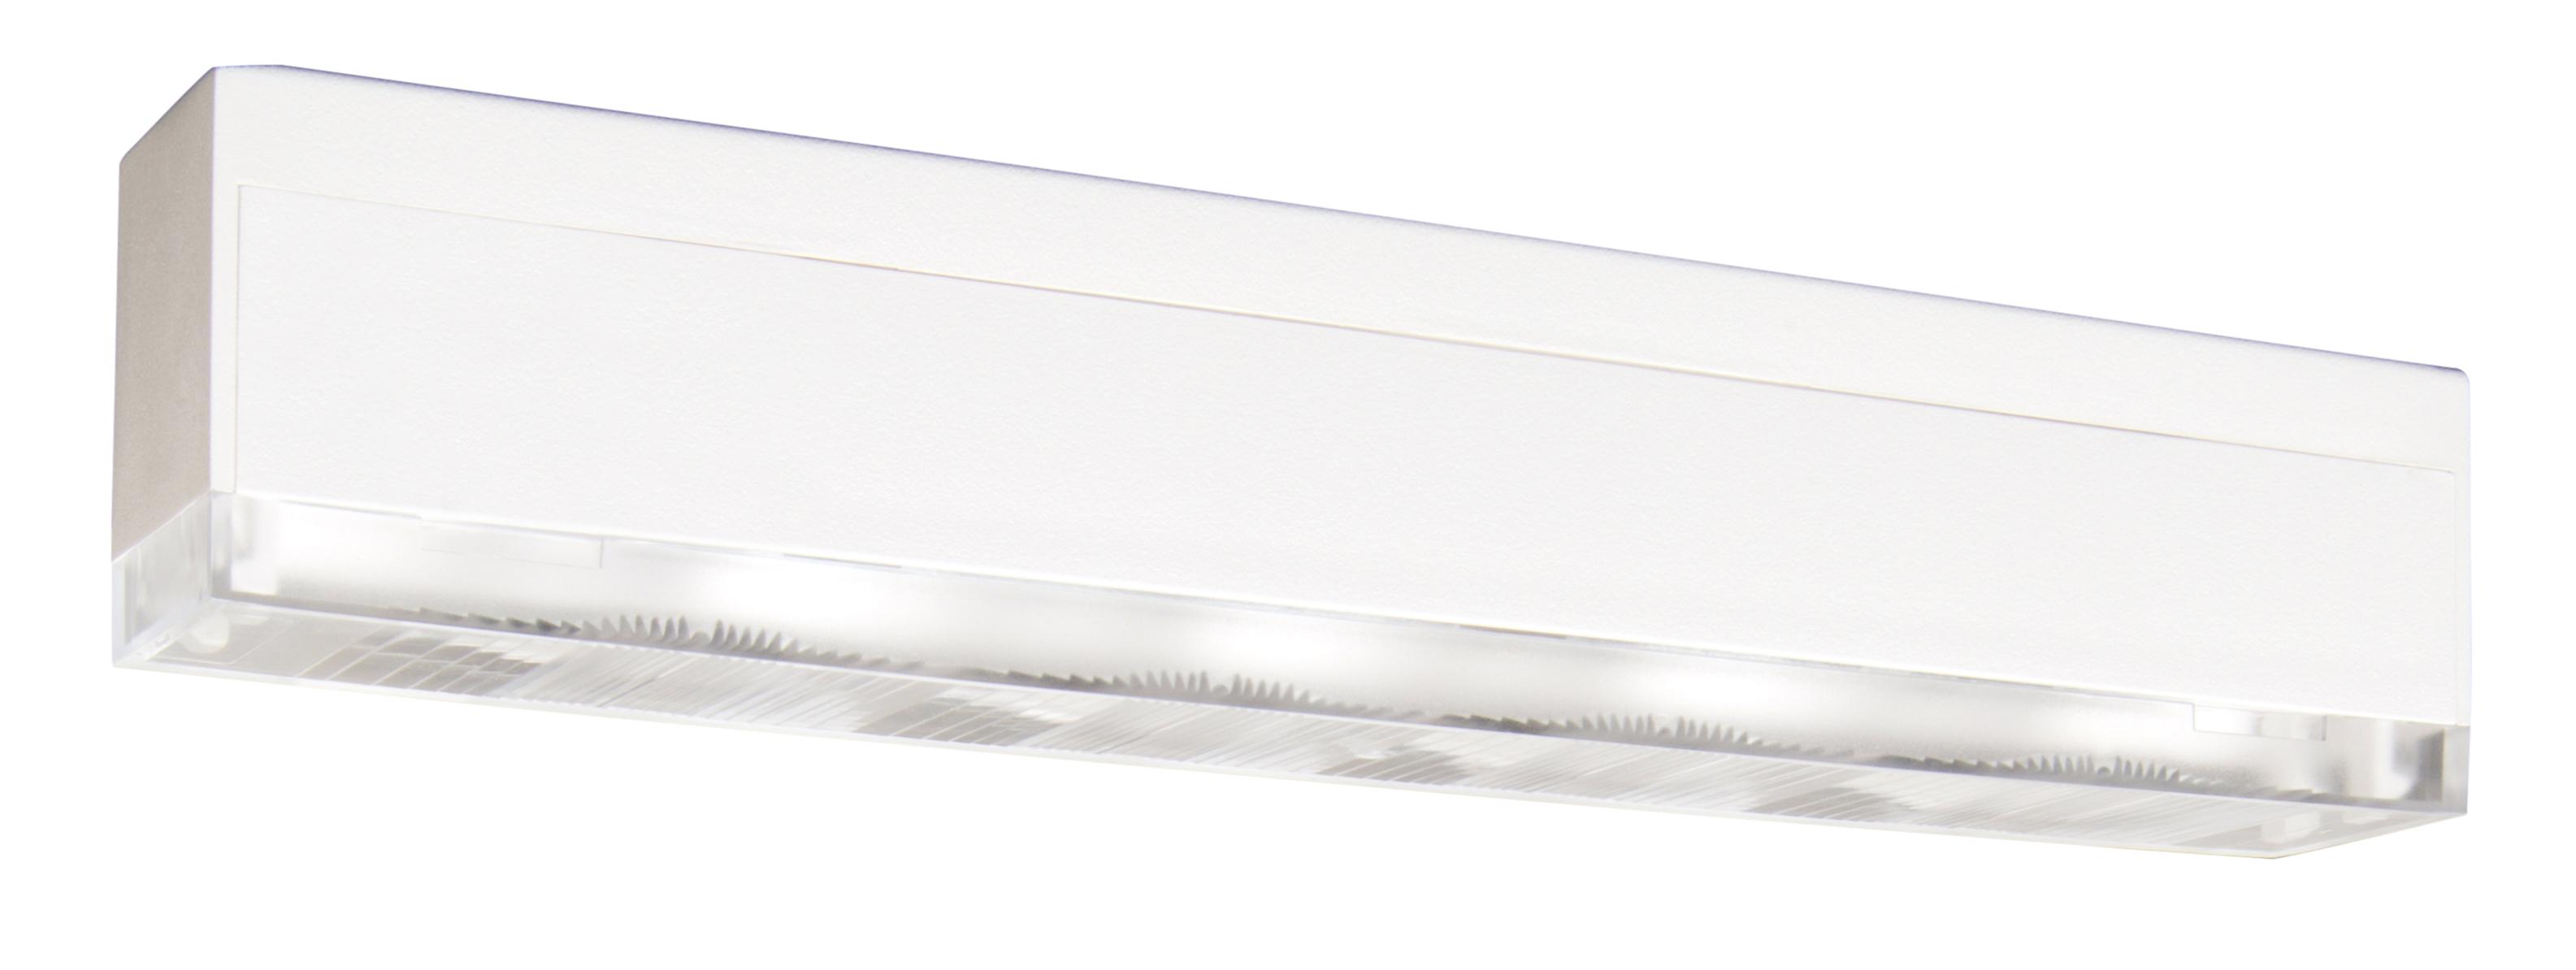 1 Stk Notleuchte KMB Wireless LED 8h 230VAC, per Funk schaltbar NLKMB008WL